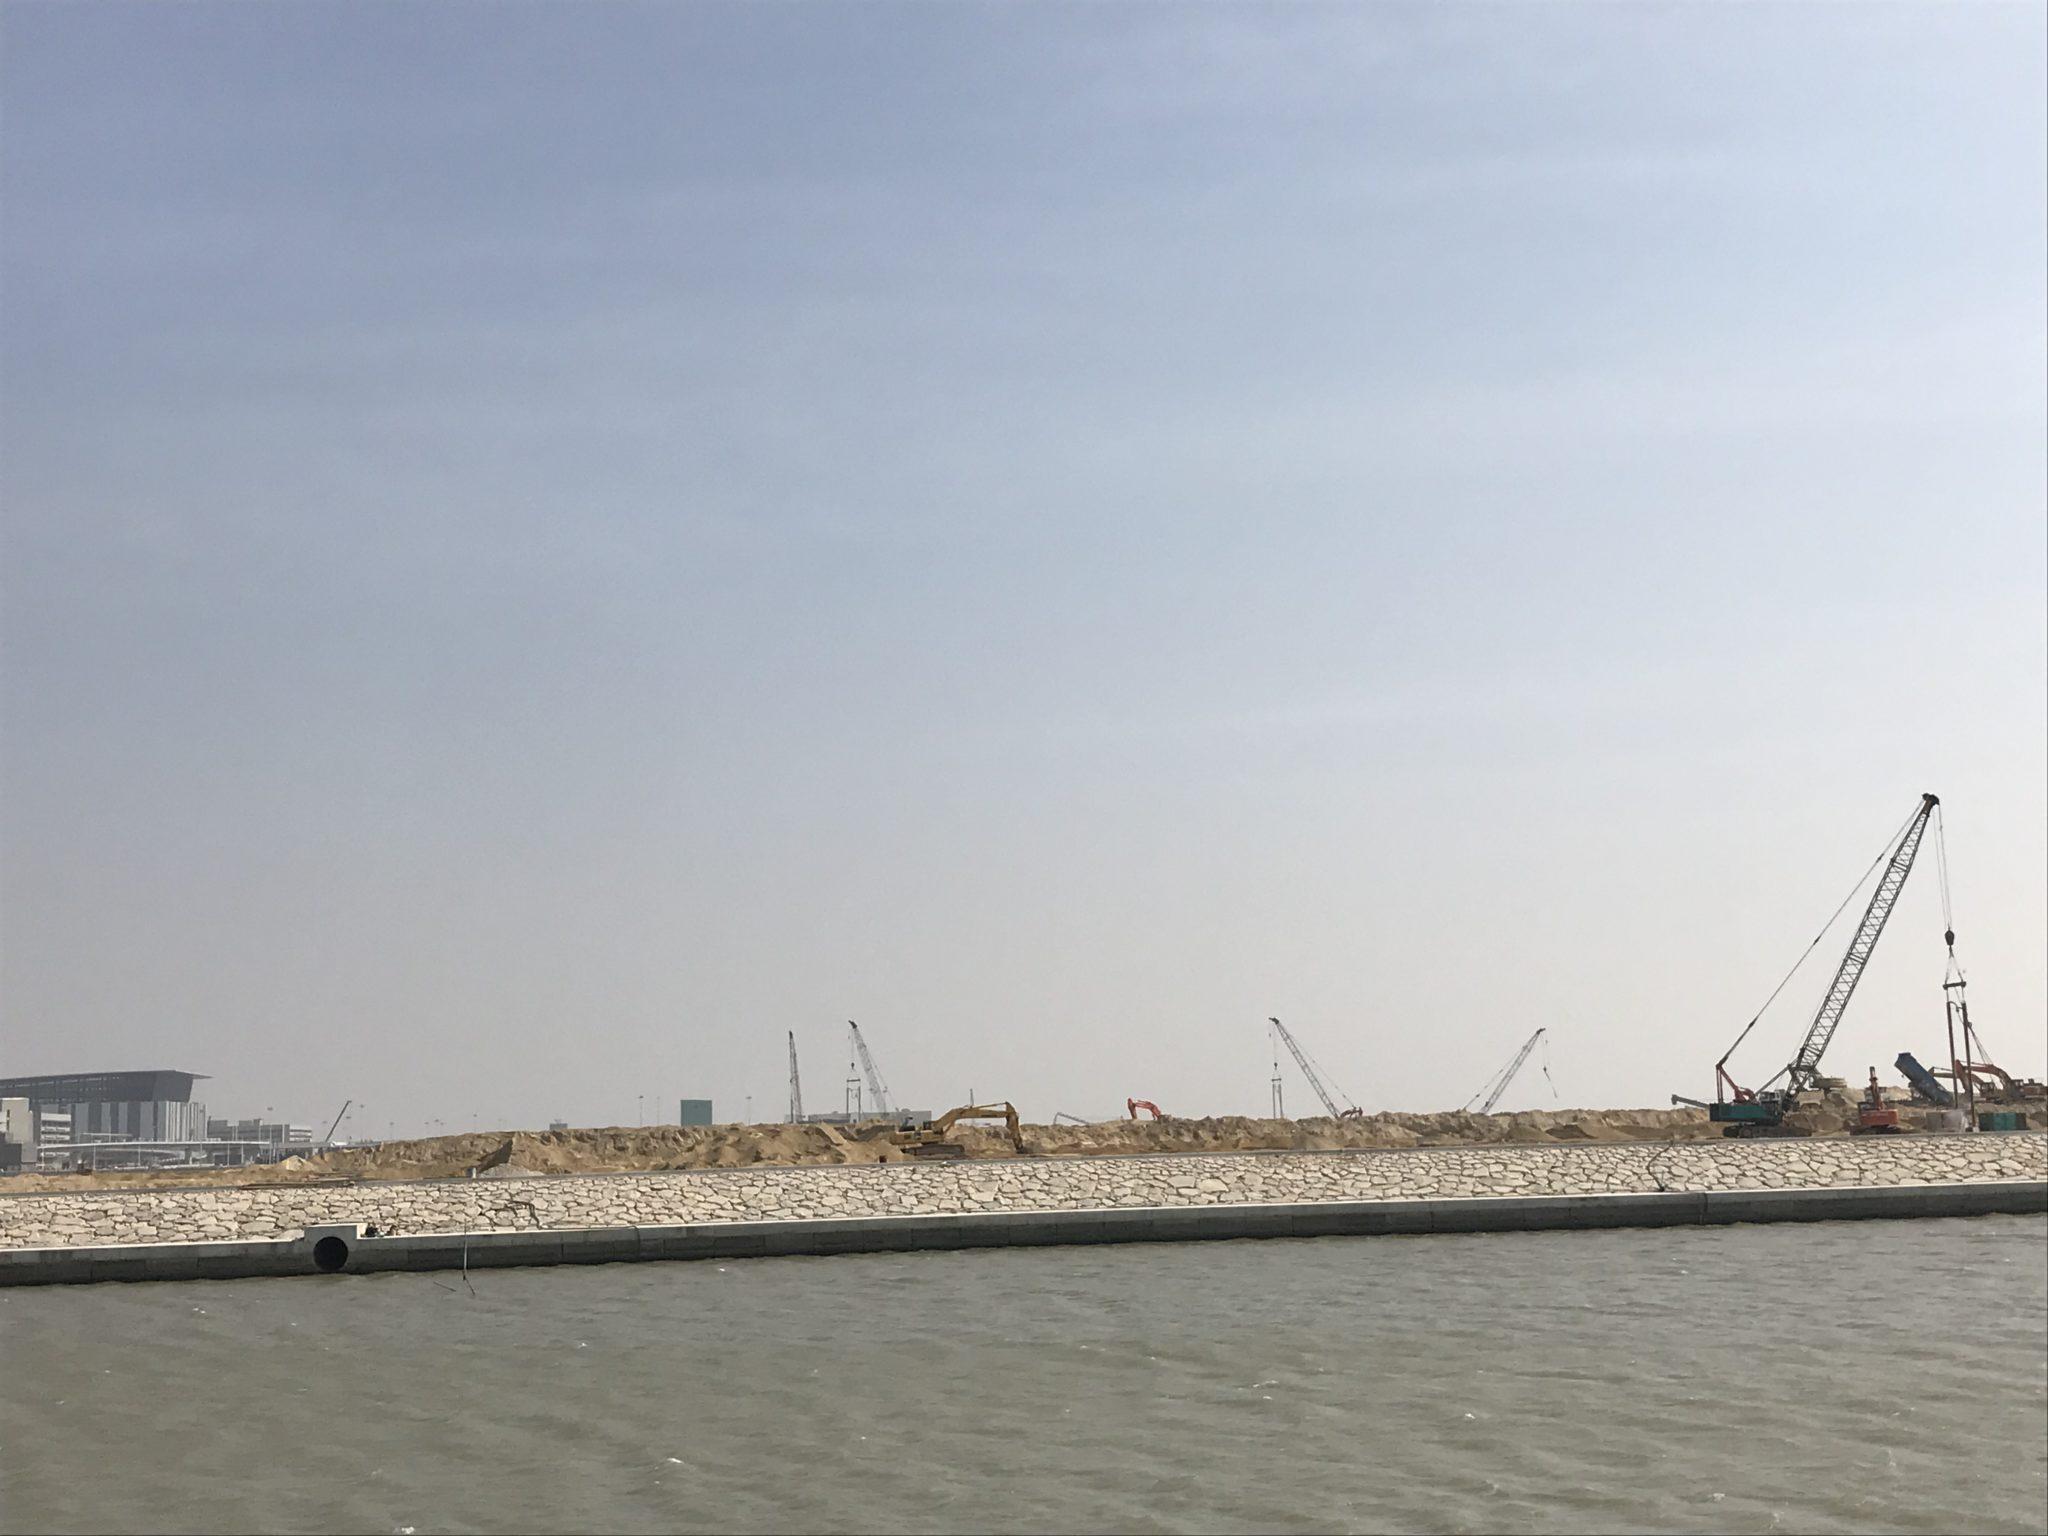 Novos aterros | Governo assinou contrato para obras na zona C